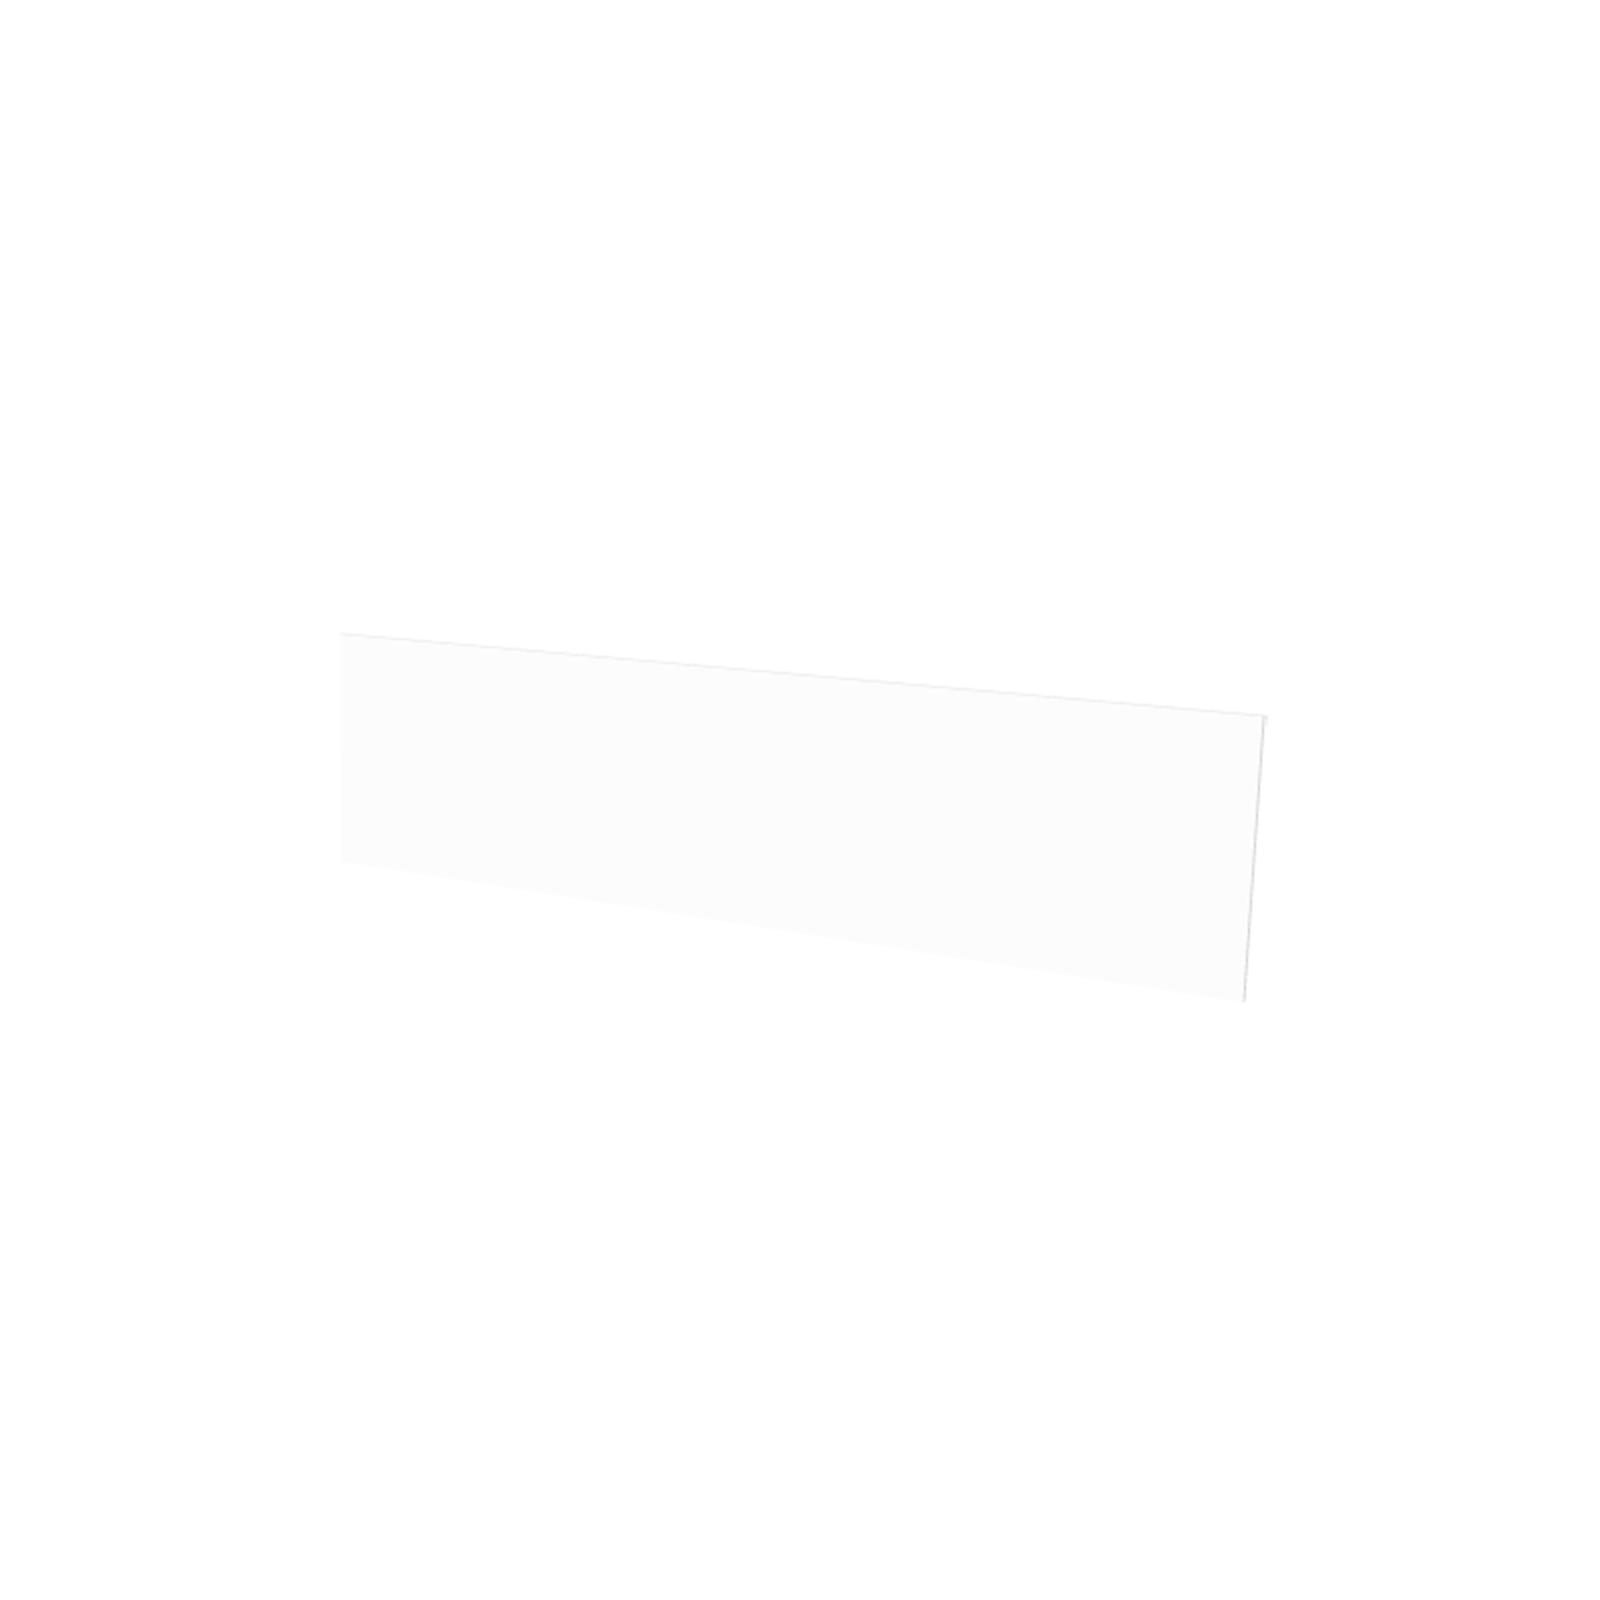 Vistelle 1200 x 300 x 4mm Salt High Gloss Acrylic Vanity Splashback